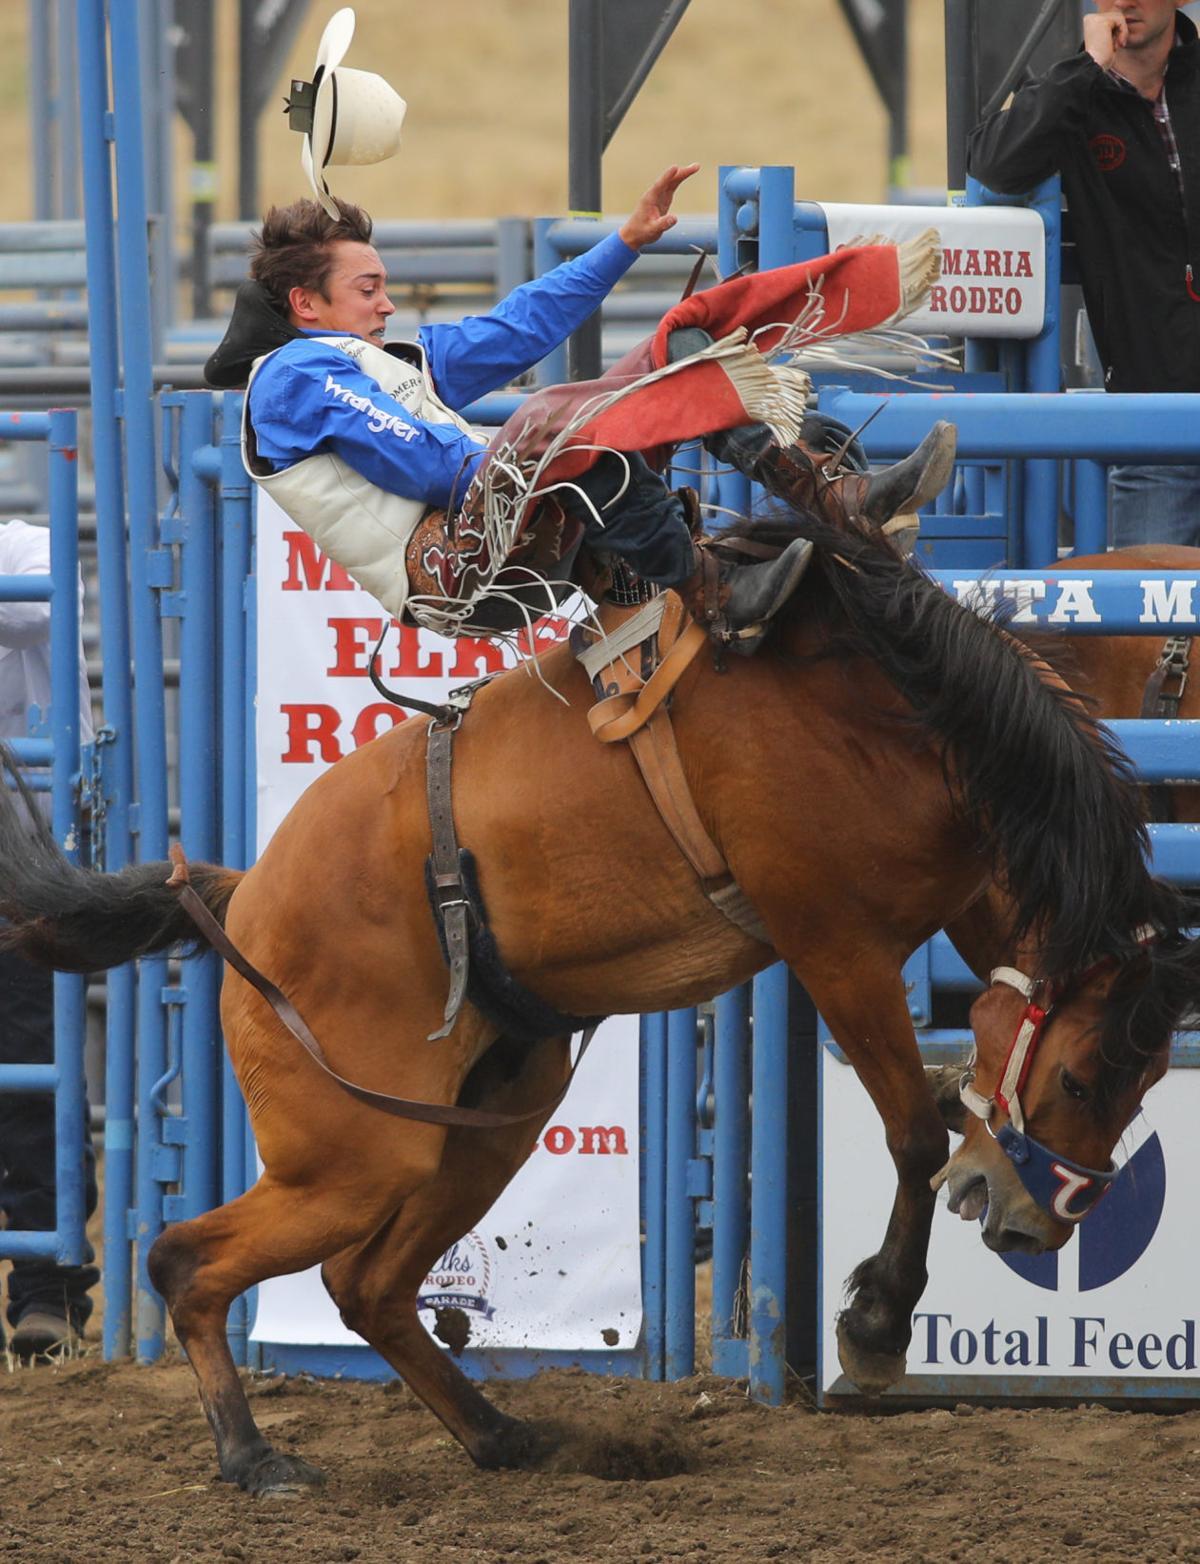 060219 Elks Rodeo Sunday 19.jpg